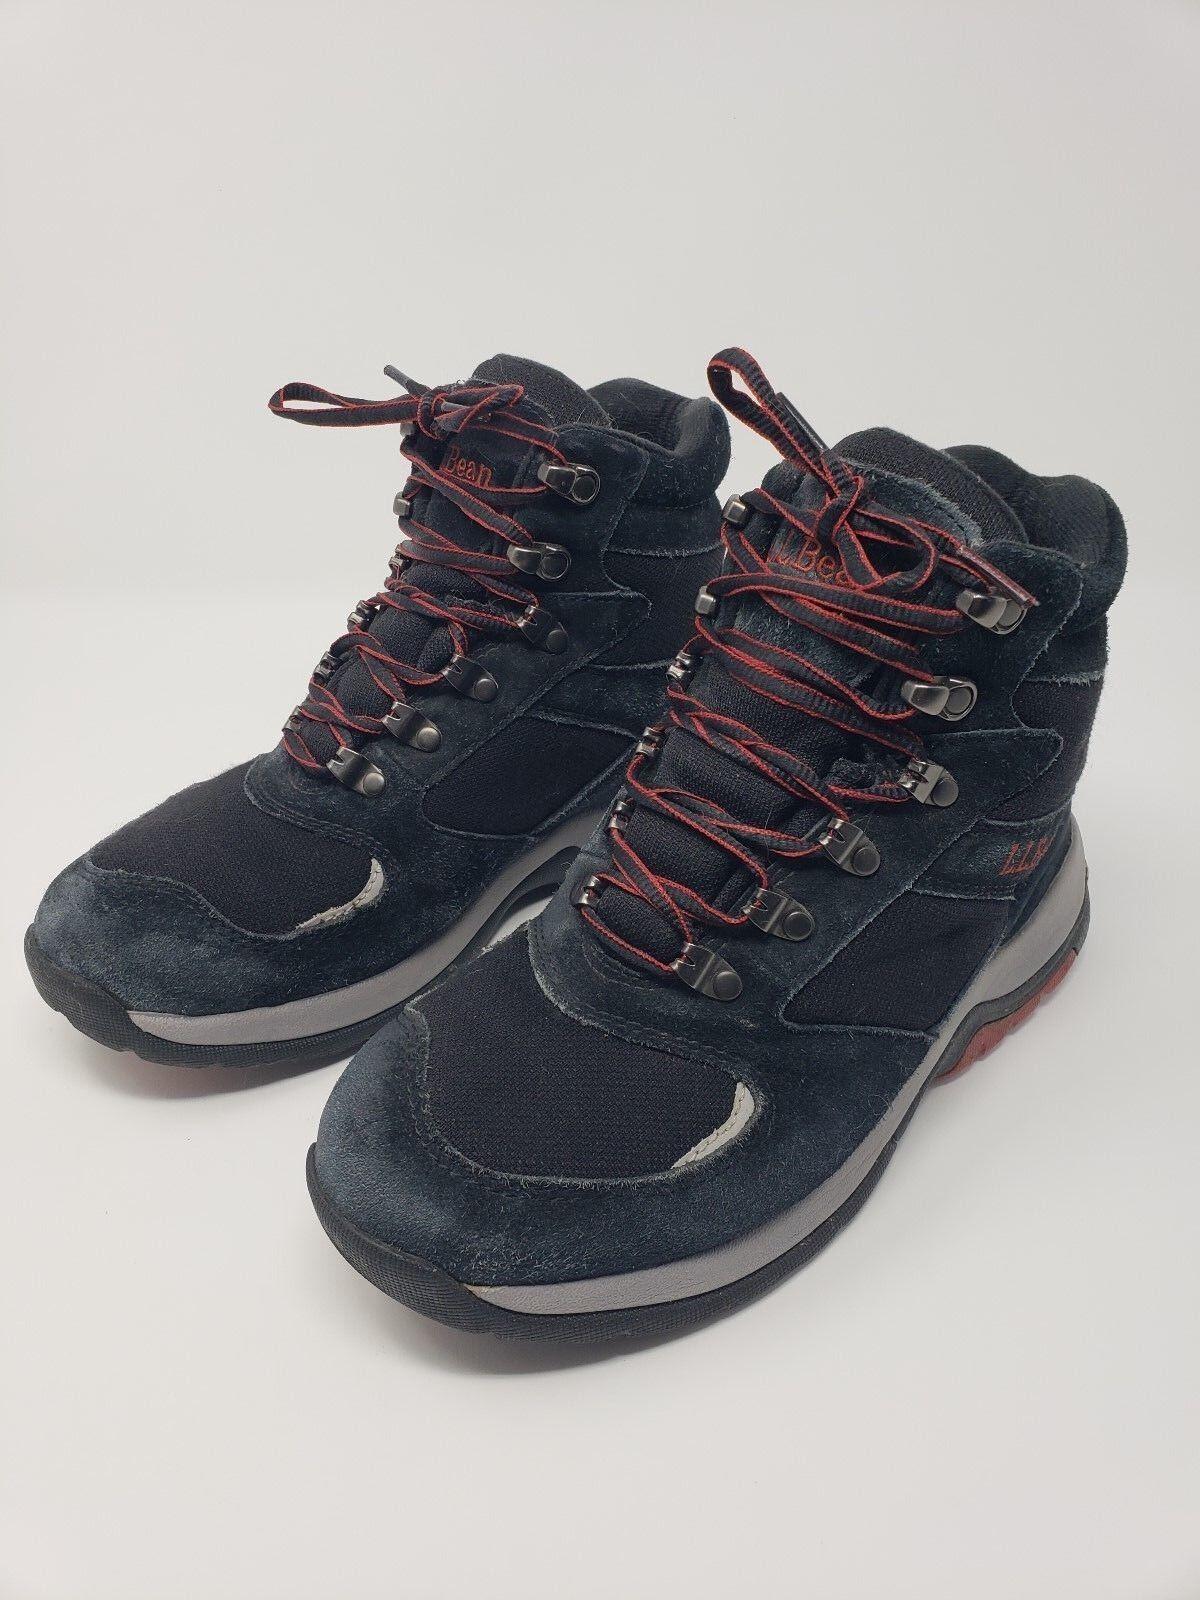 L.L. Bean Black Winter Boots with Primaloft Size 7.5 Medium